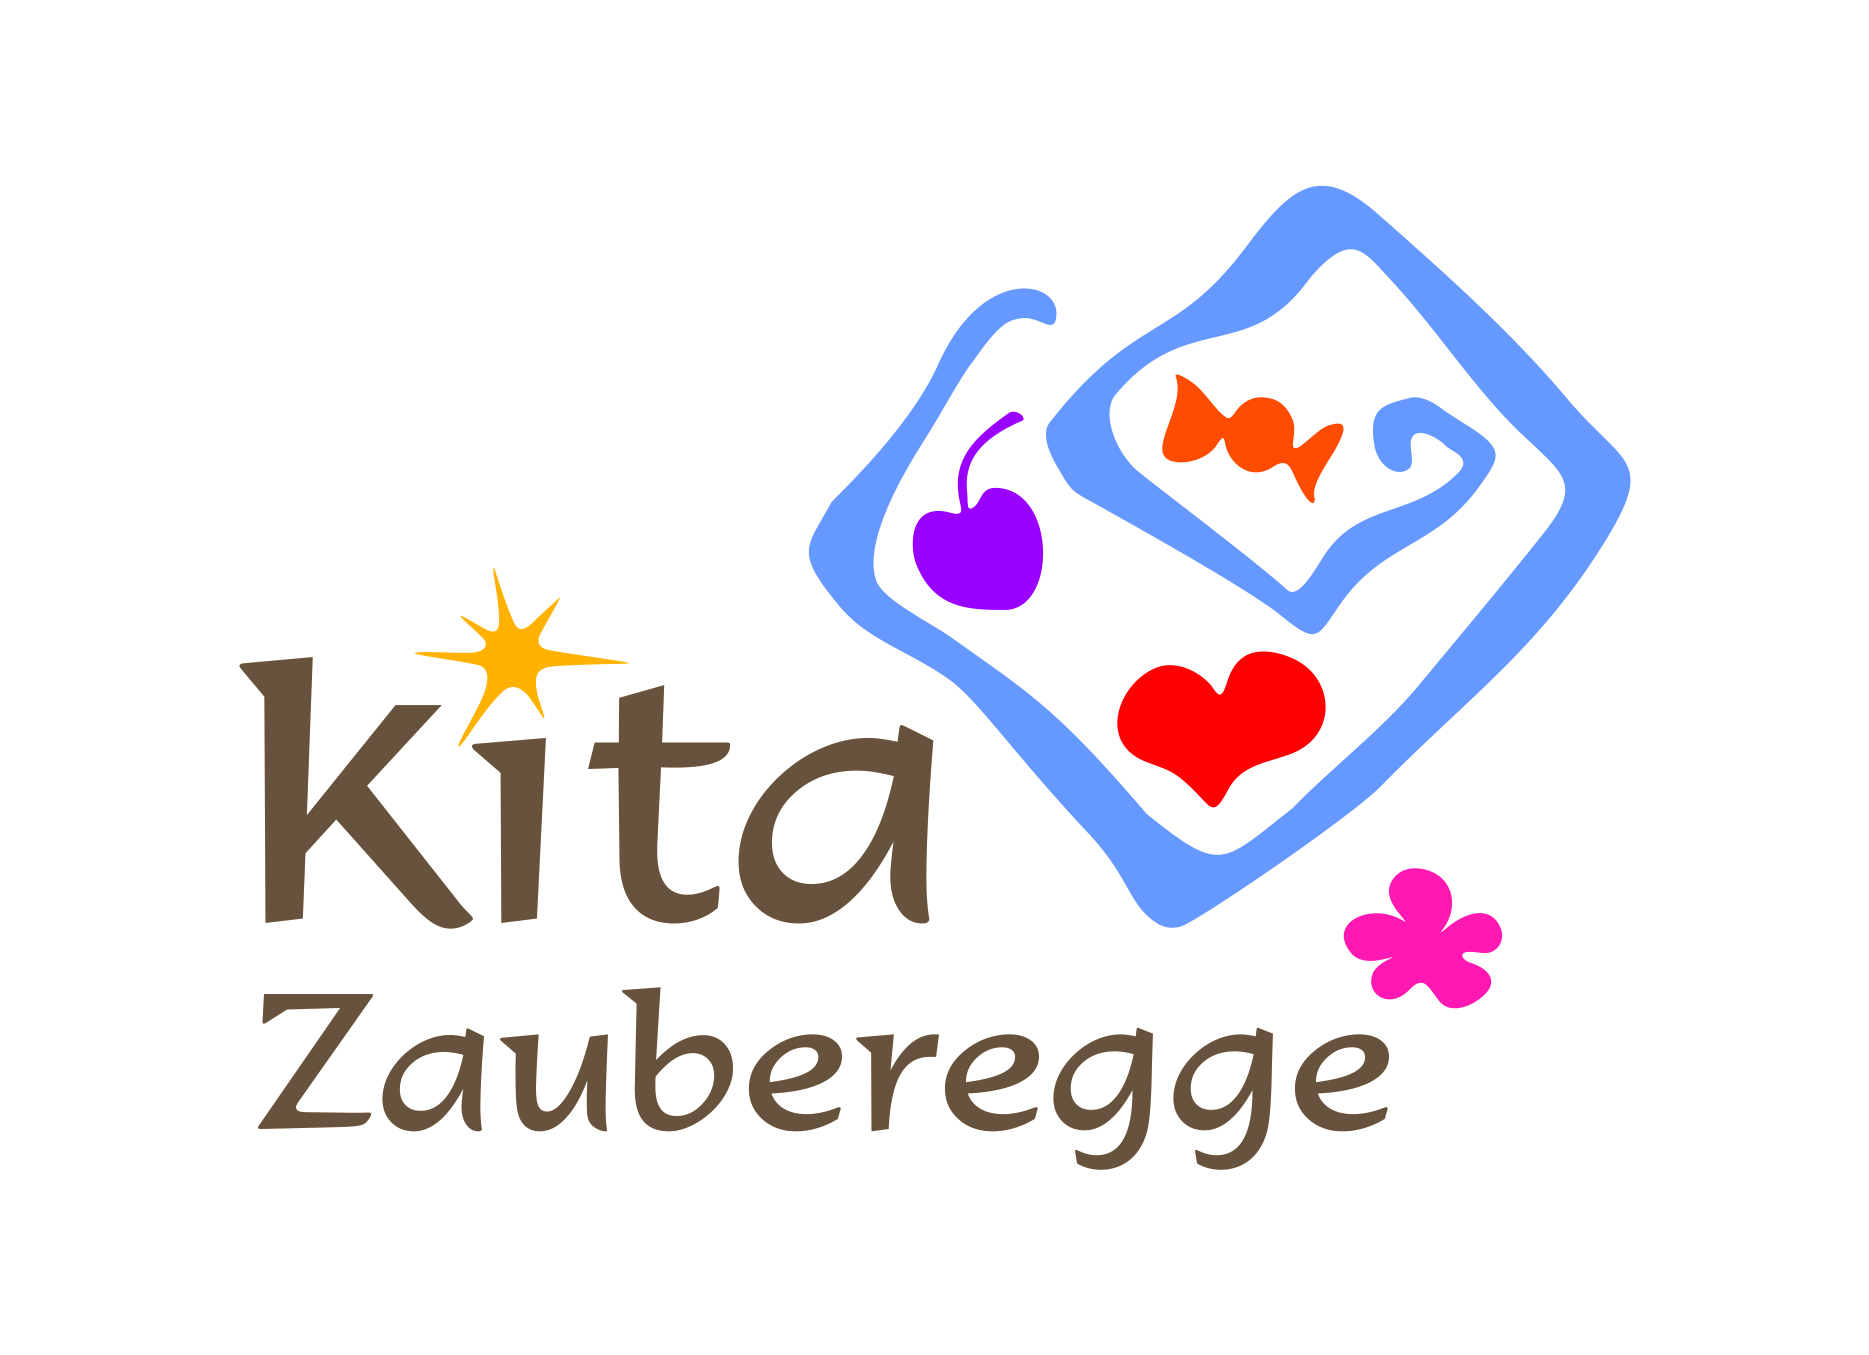 Logo_Kita_Zauberegge_CMYK